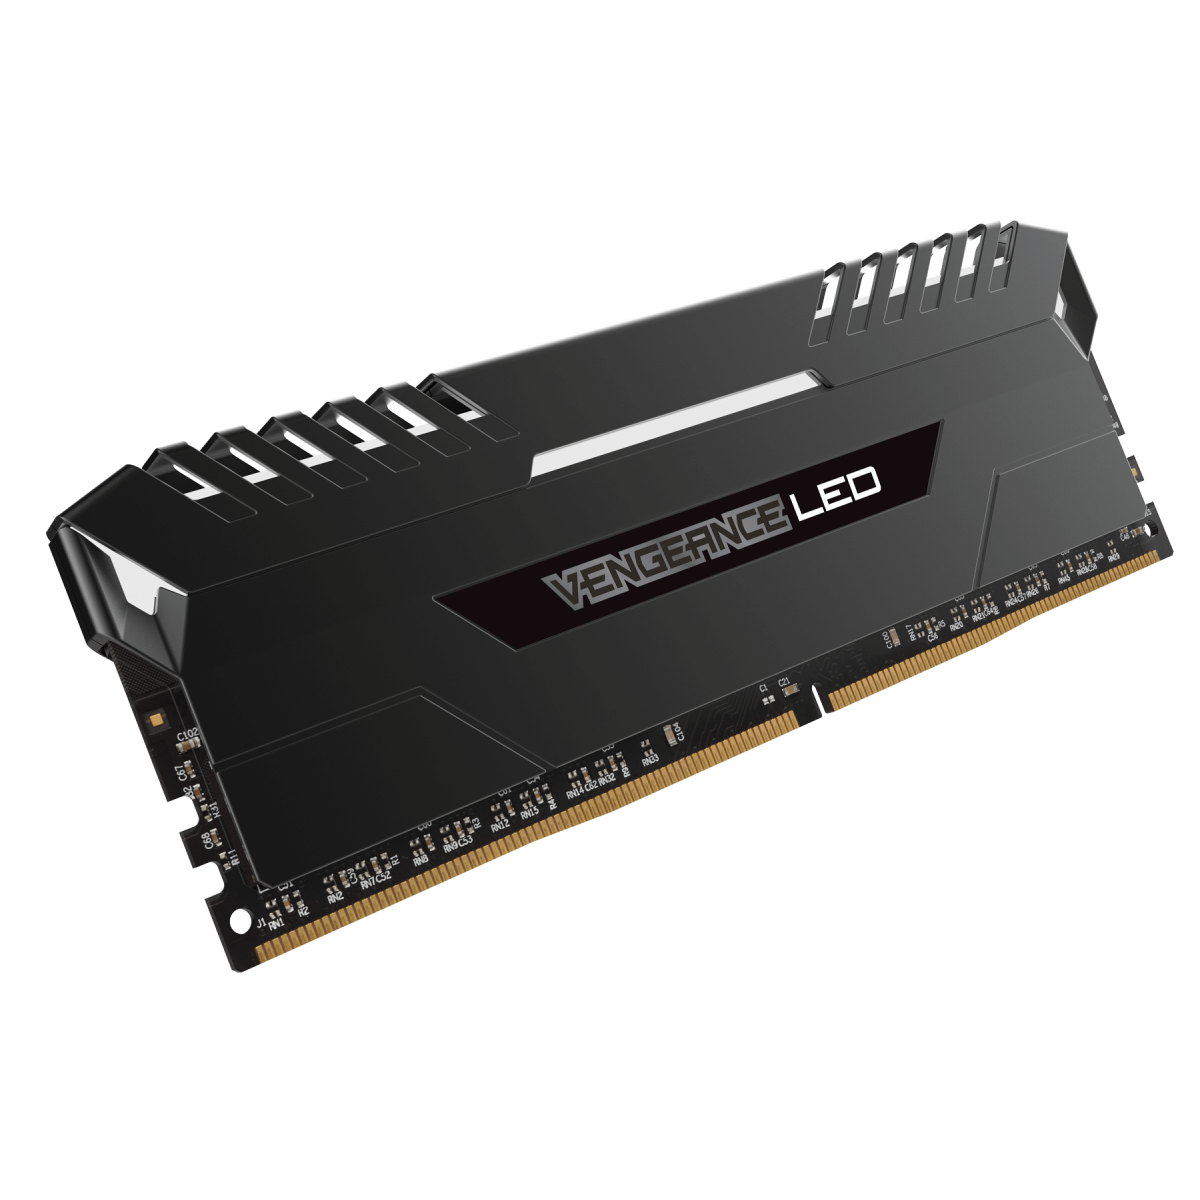 Memória DDR4 Corsair Vengeance, 16GB (2x8GB) 2666MHz, LED White, CMU16GX4M2A2666C16